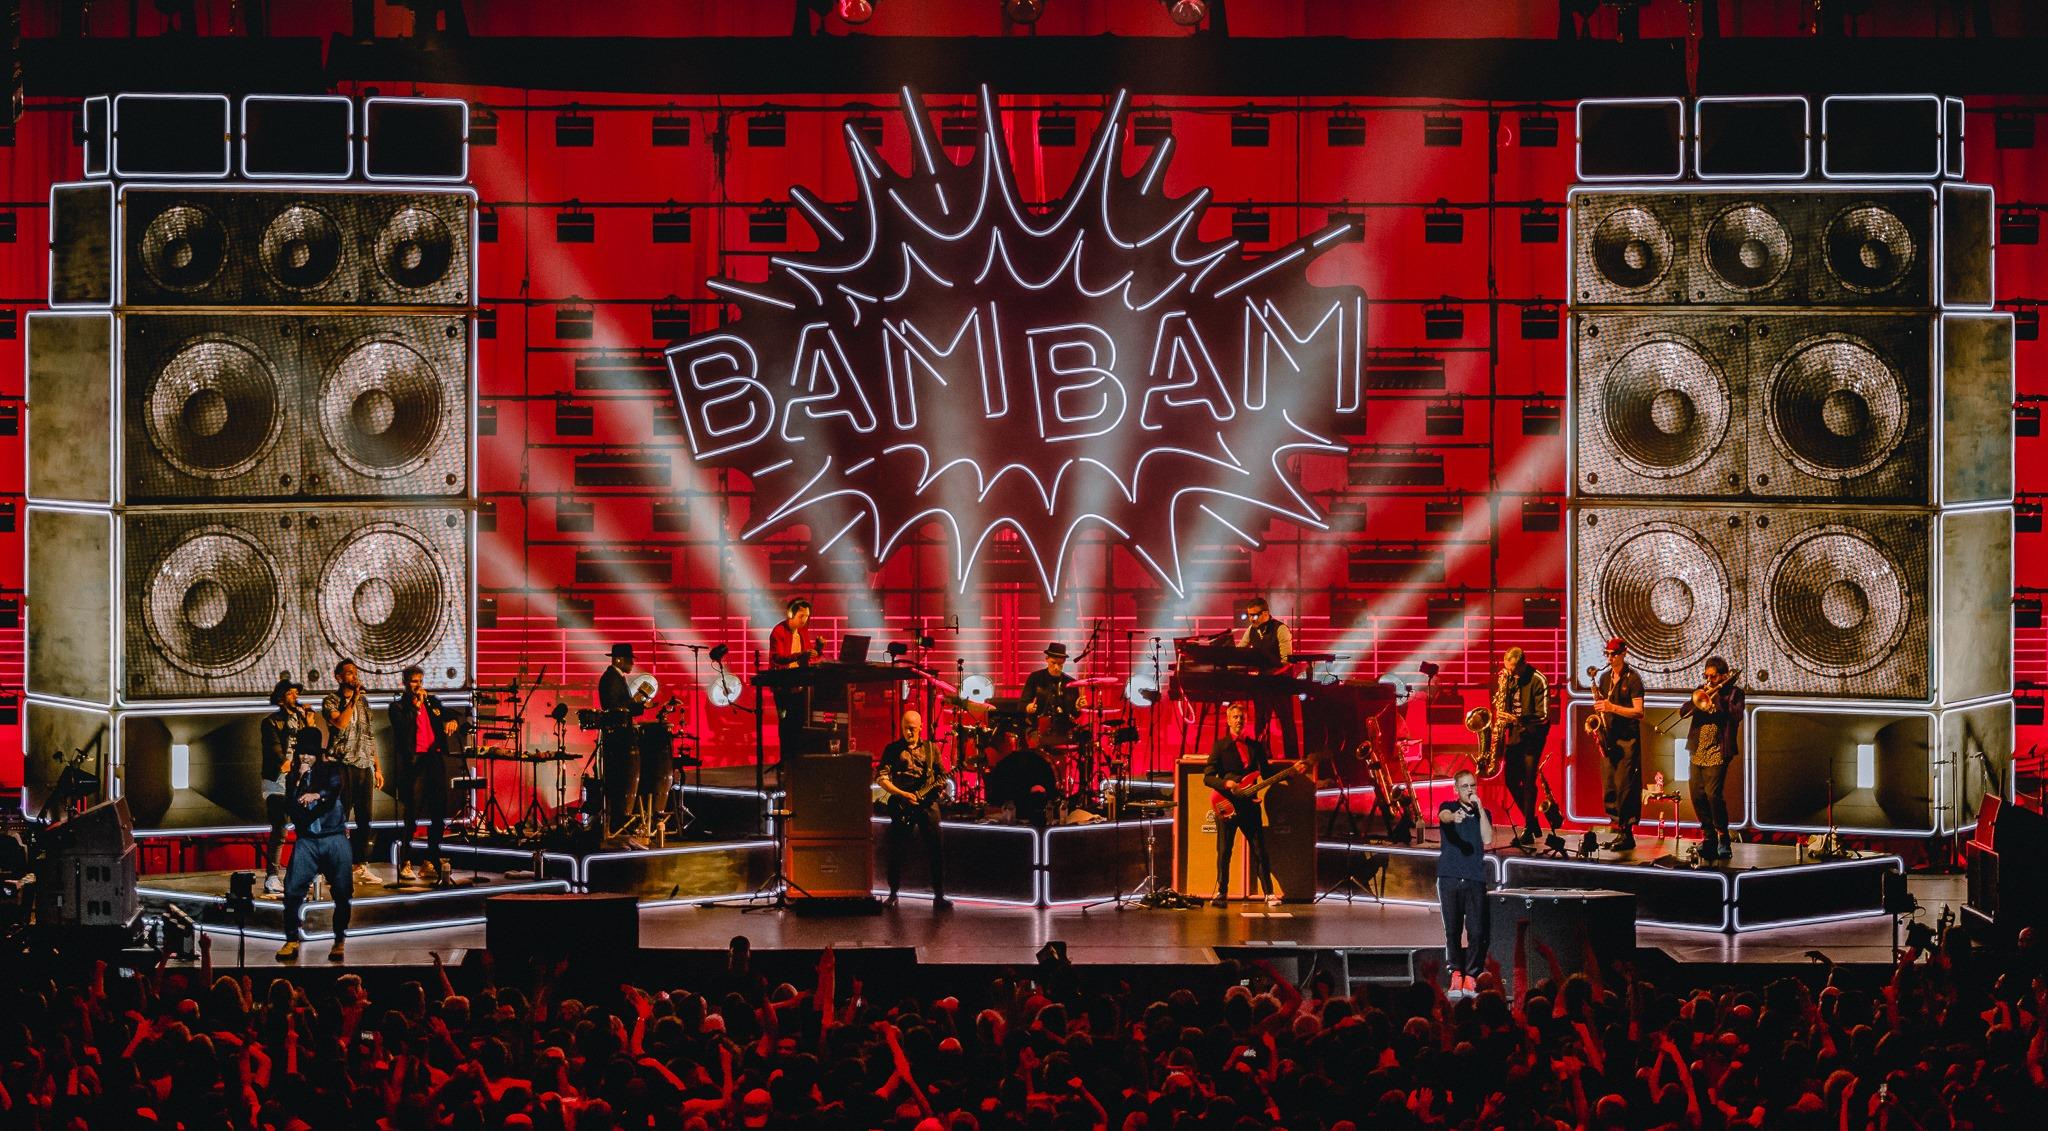 Seeed 2019 Live in Berlin (Foto: Andreas Budtke)